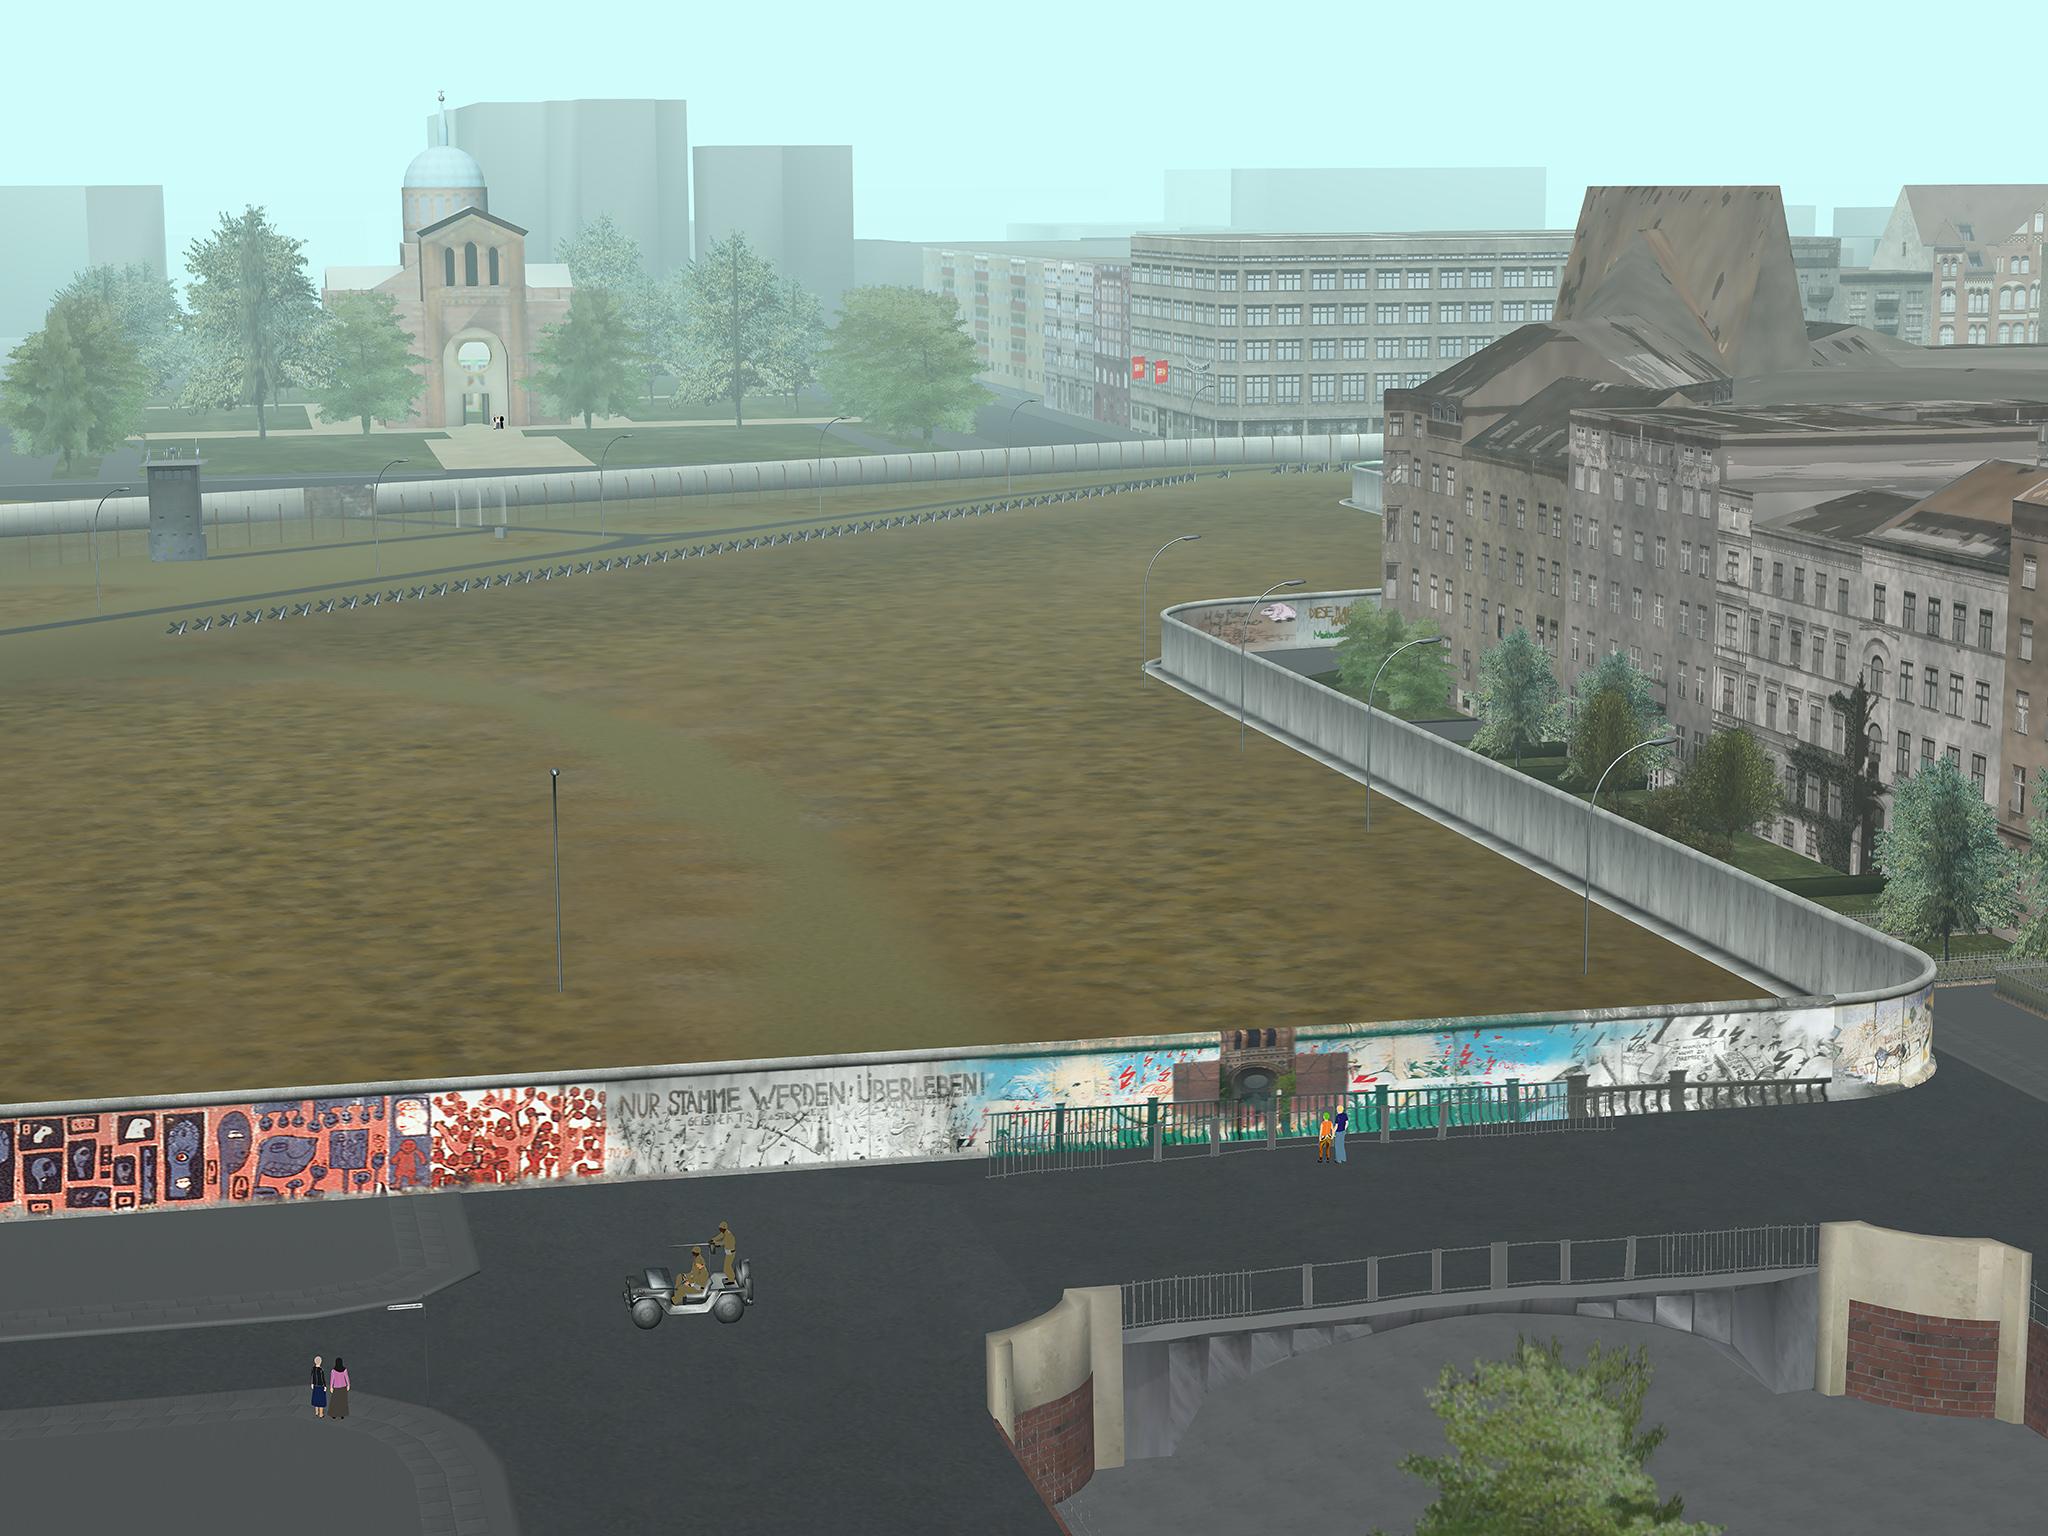 T + T (TAMIKO THIEL und TERESA REUTER): Virtuelle Mauer/ReConstructing the Wall